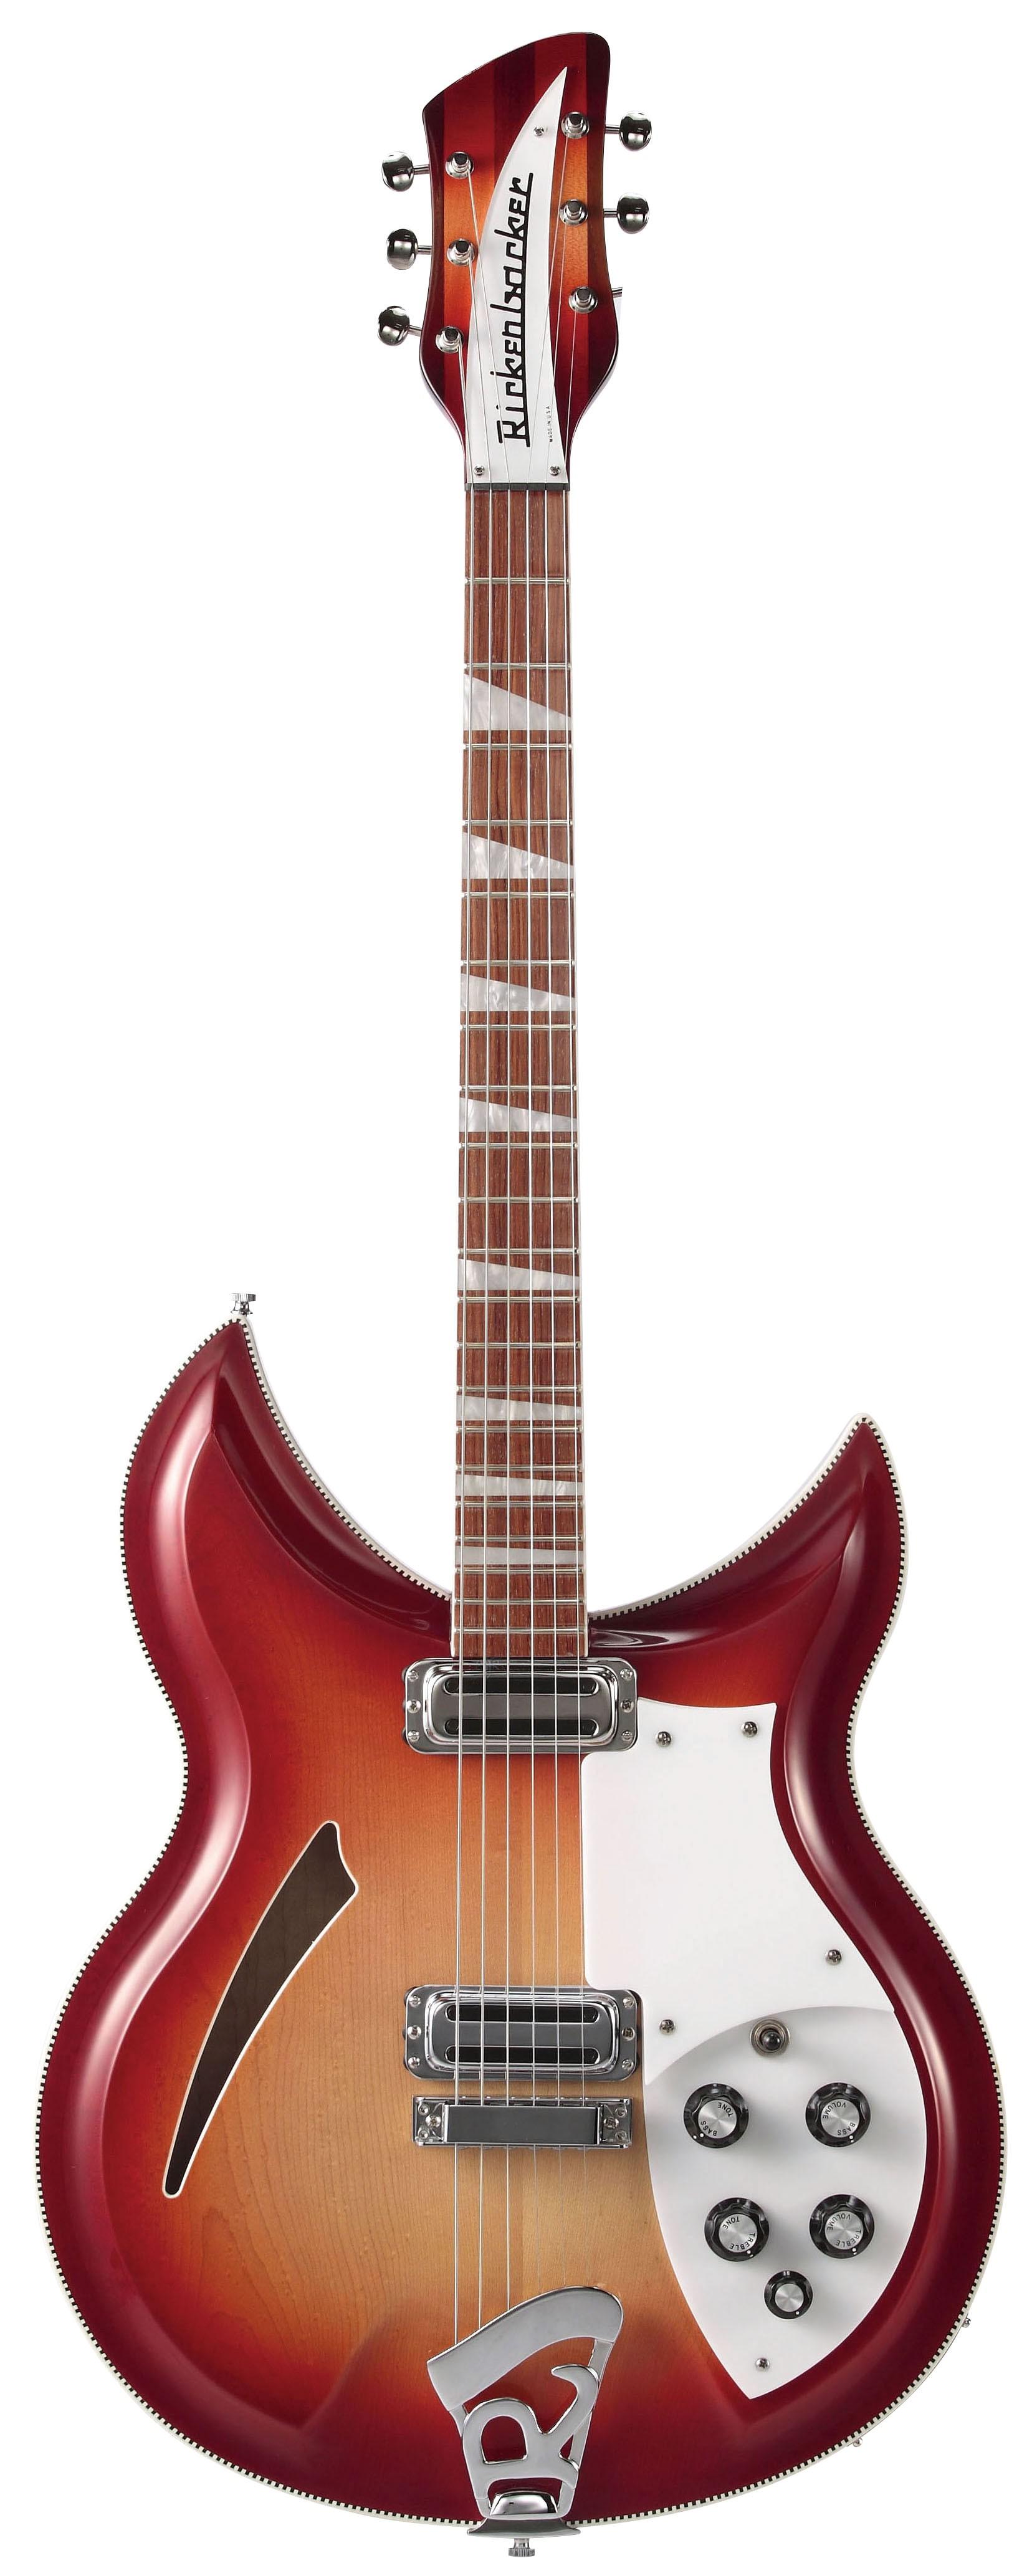 Rickenbacker 381V69 - Fireglo